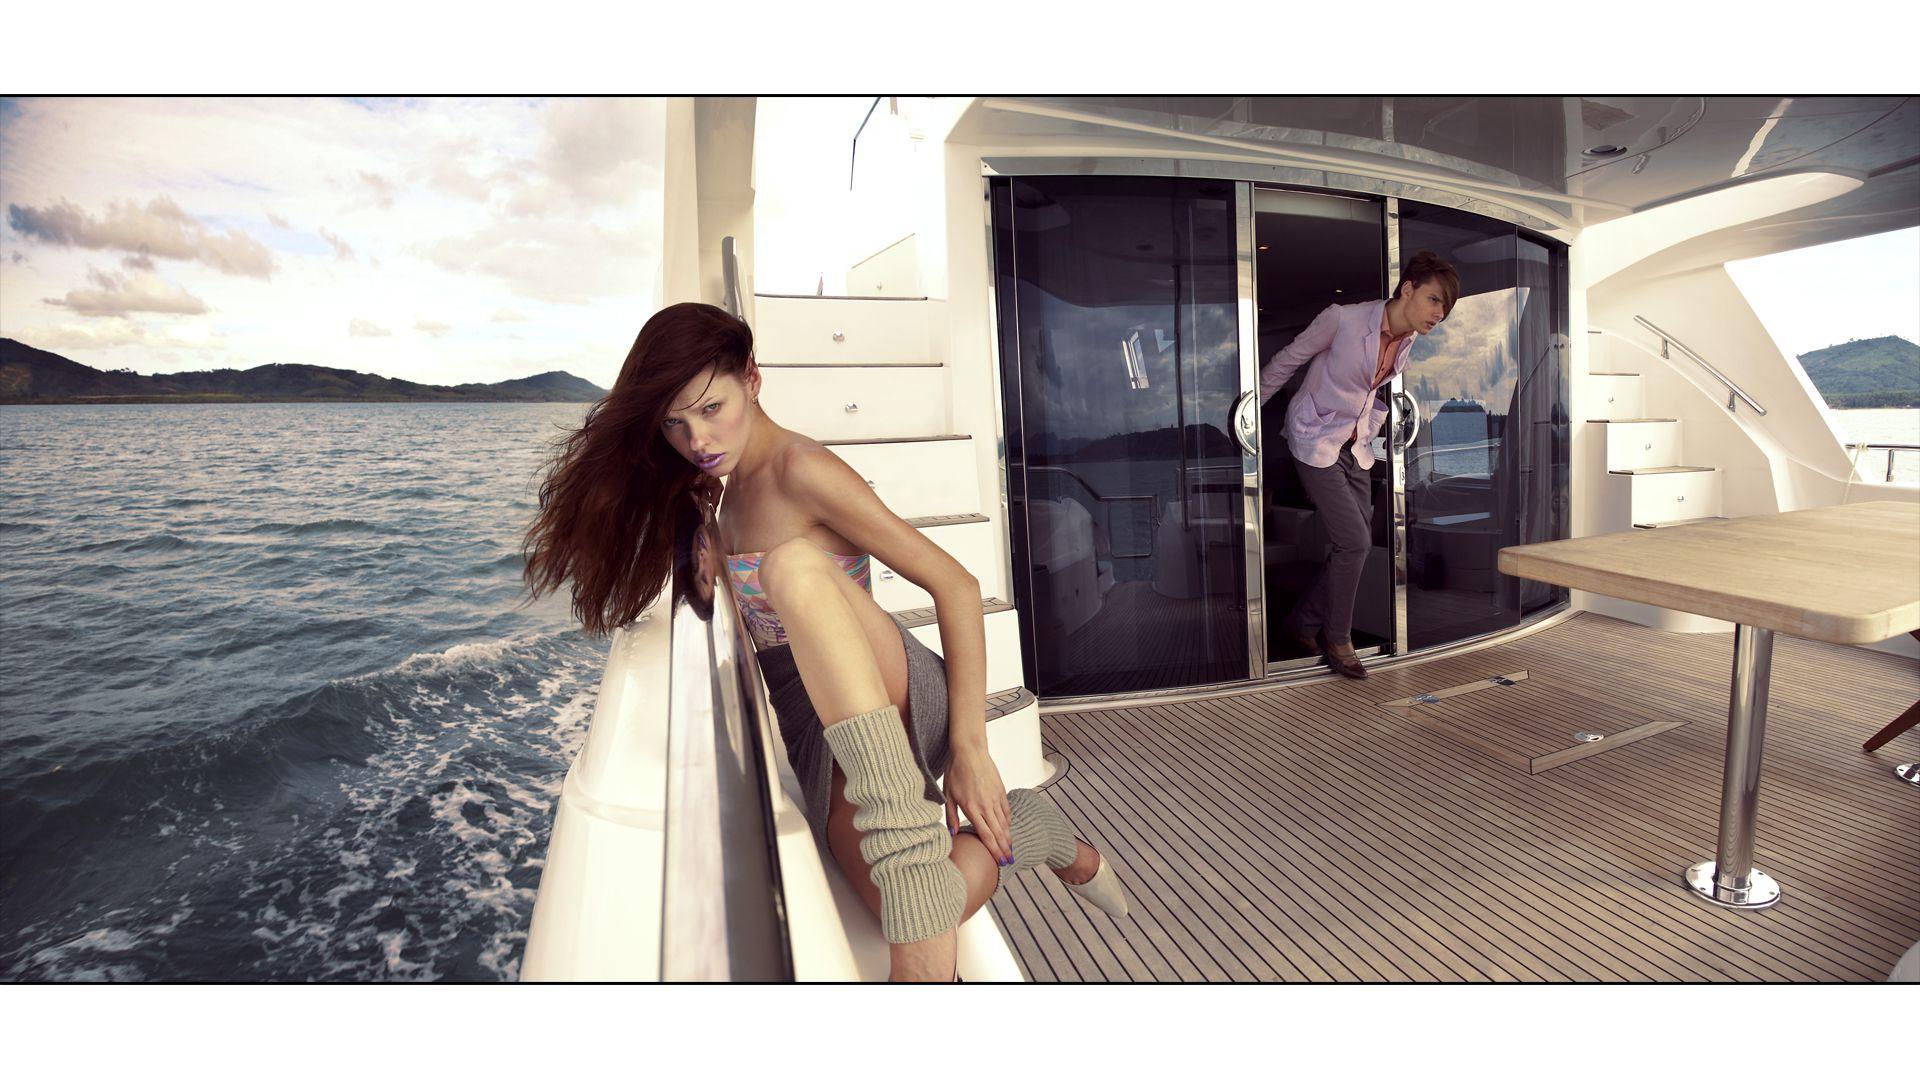 yacht wallpaper iphone